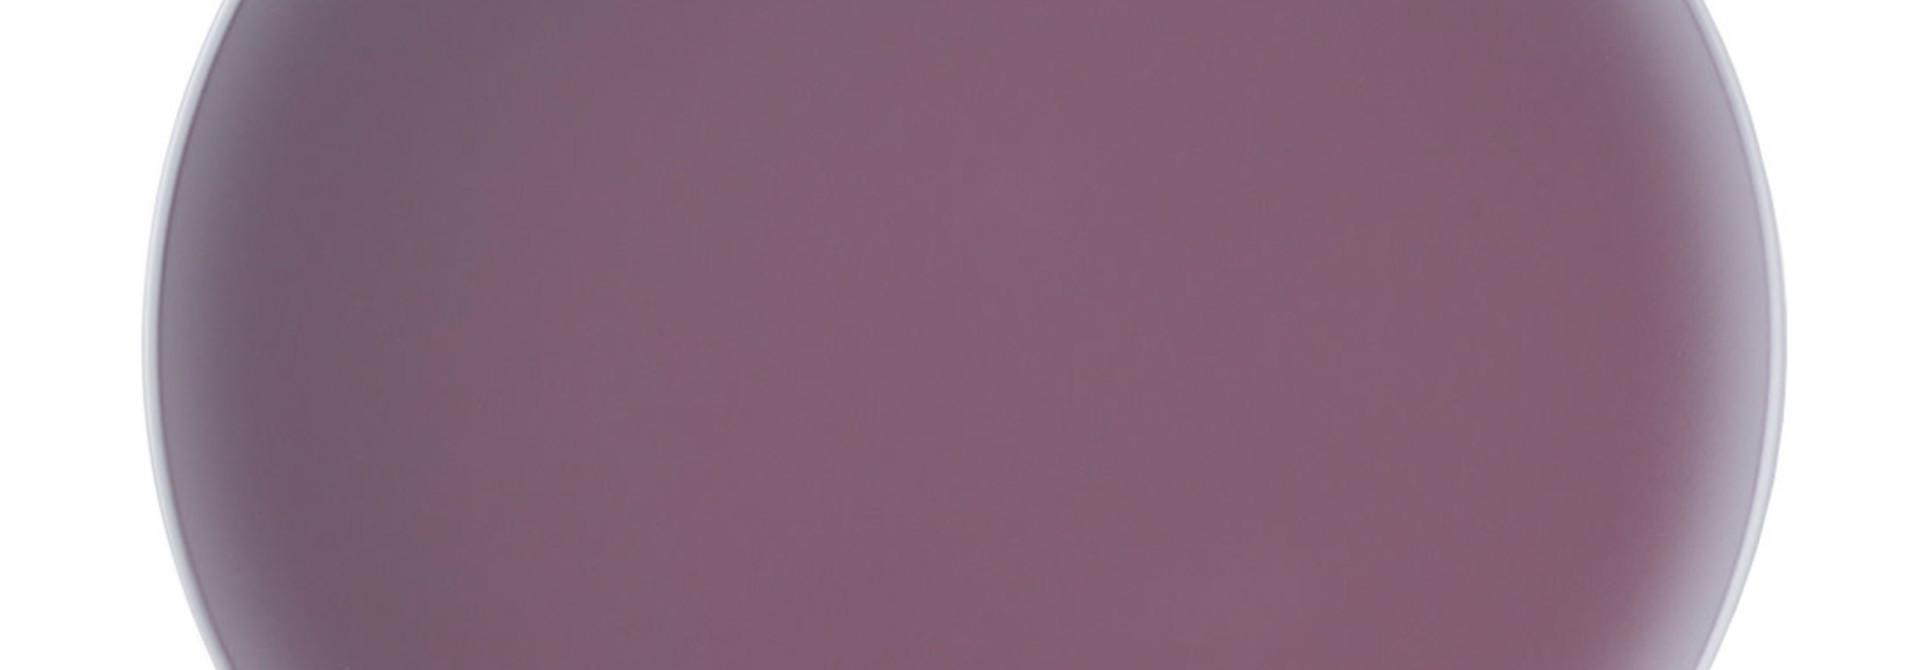 Blur Box Medium Purple